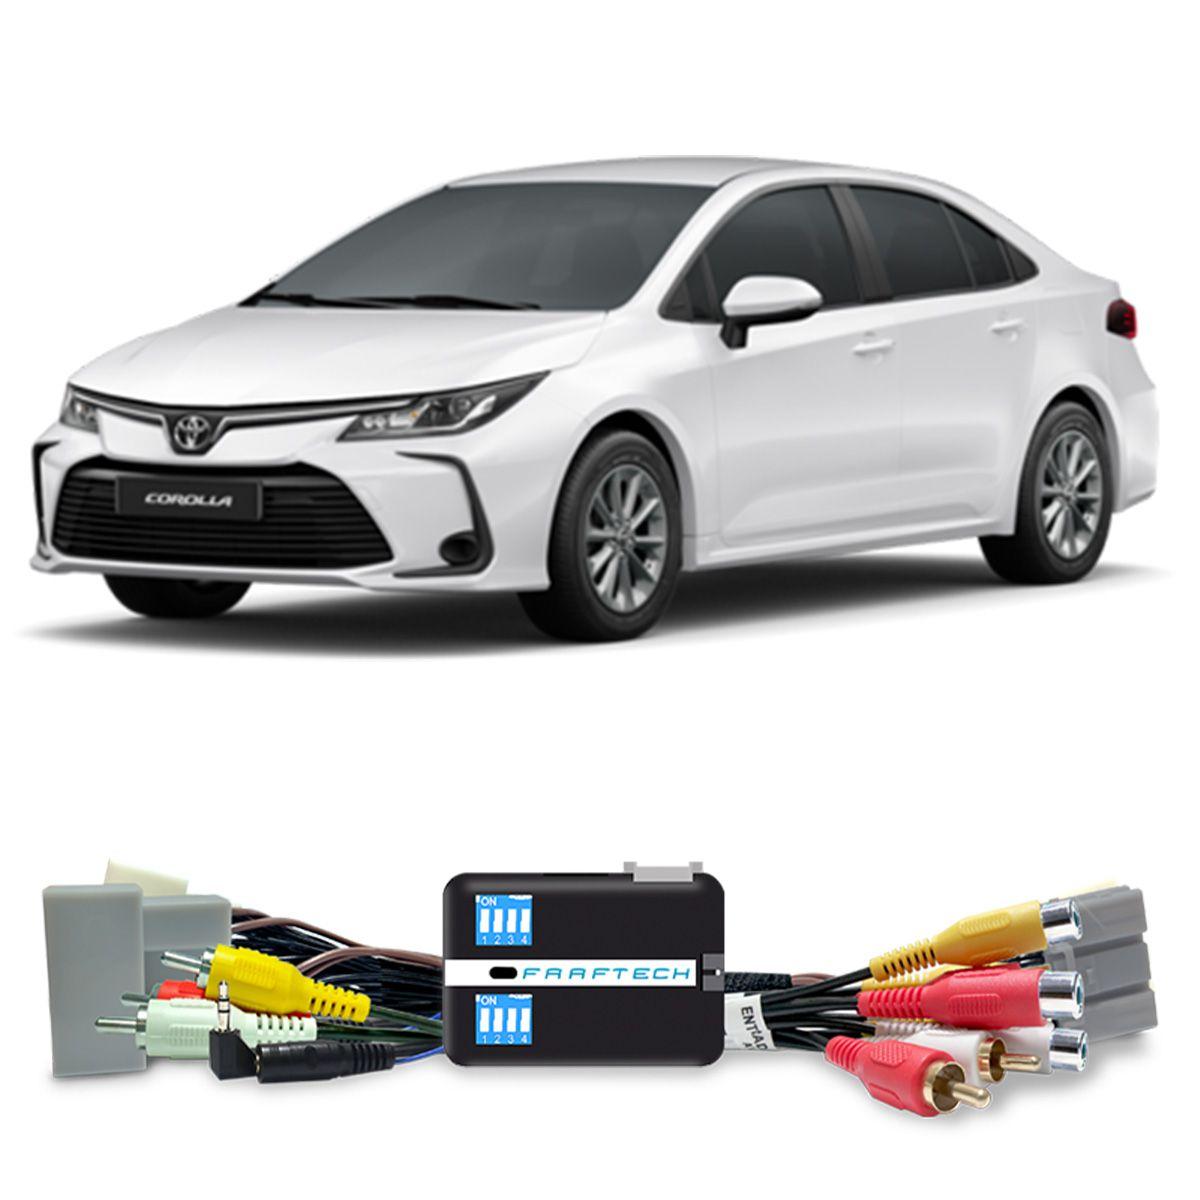 Desbloqueio de Multimidia Toyota Corolla Hilux SW4 2020 RAV4 2020 Faaftech FT-VF-TY5